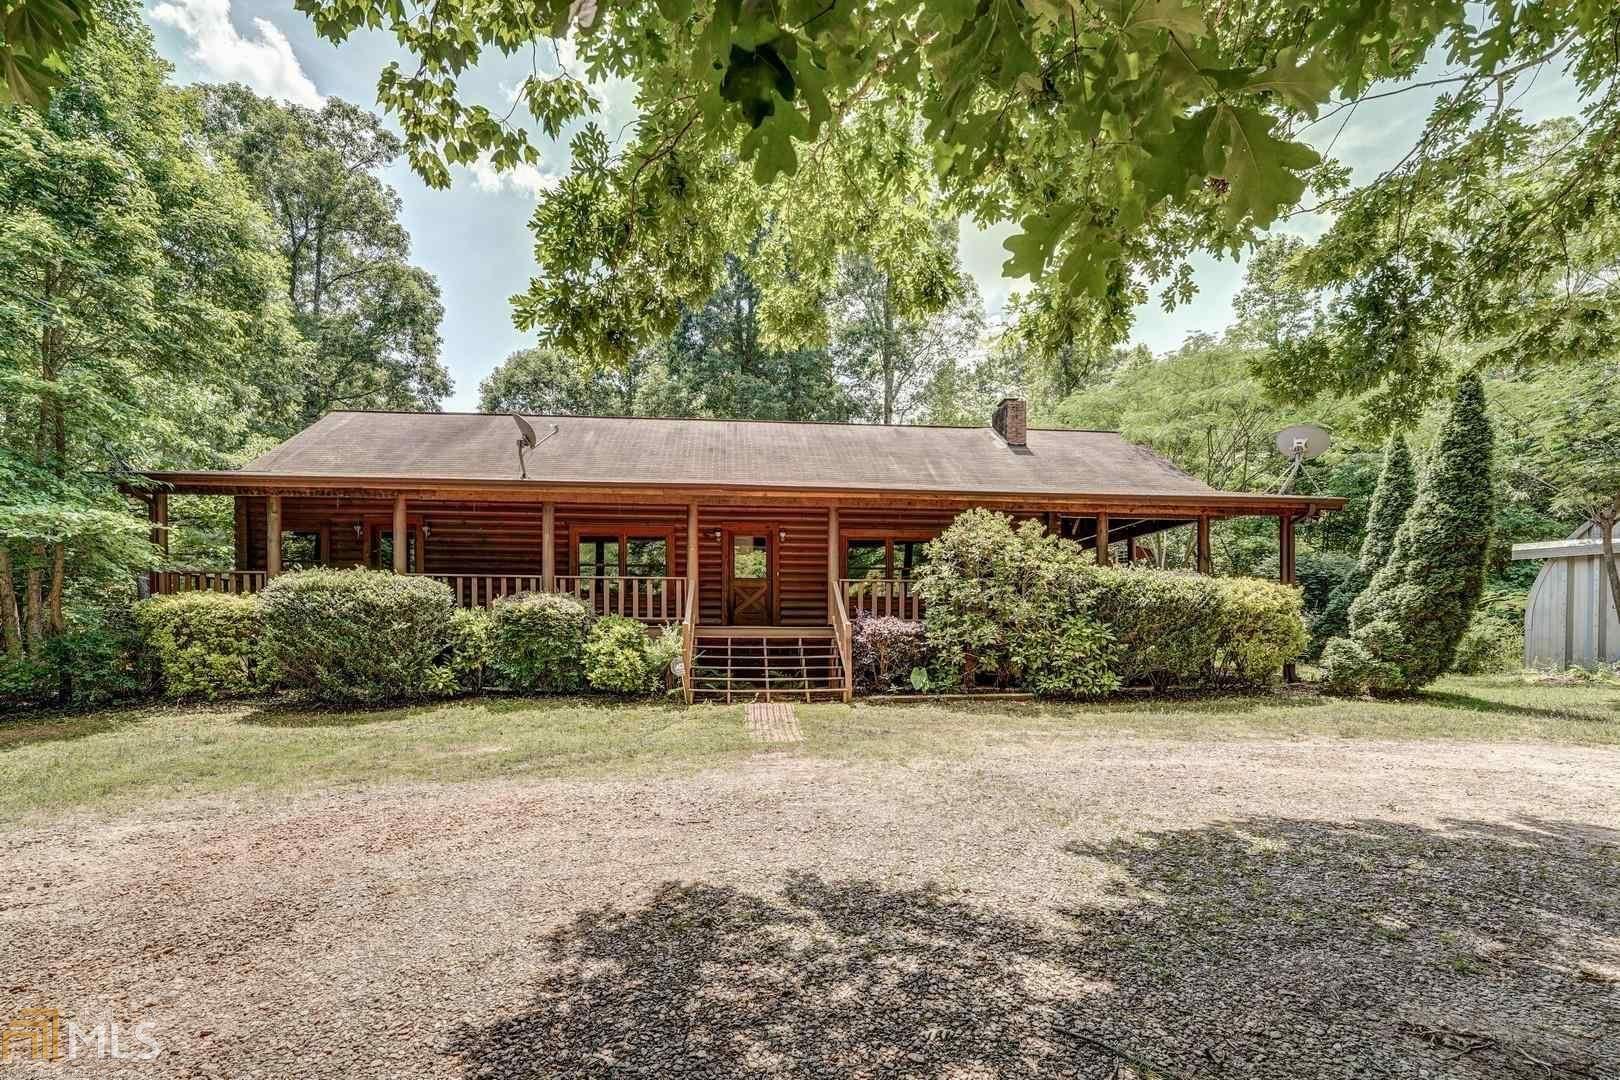 1974 Meadows Rd, Newborn, GA 30056 - MLS#: 8989682